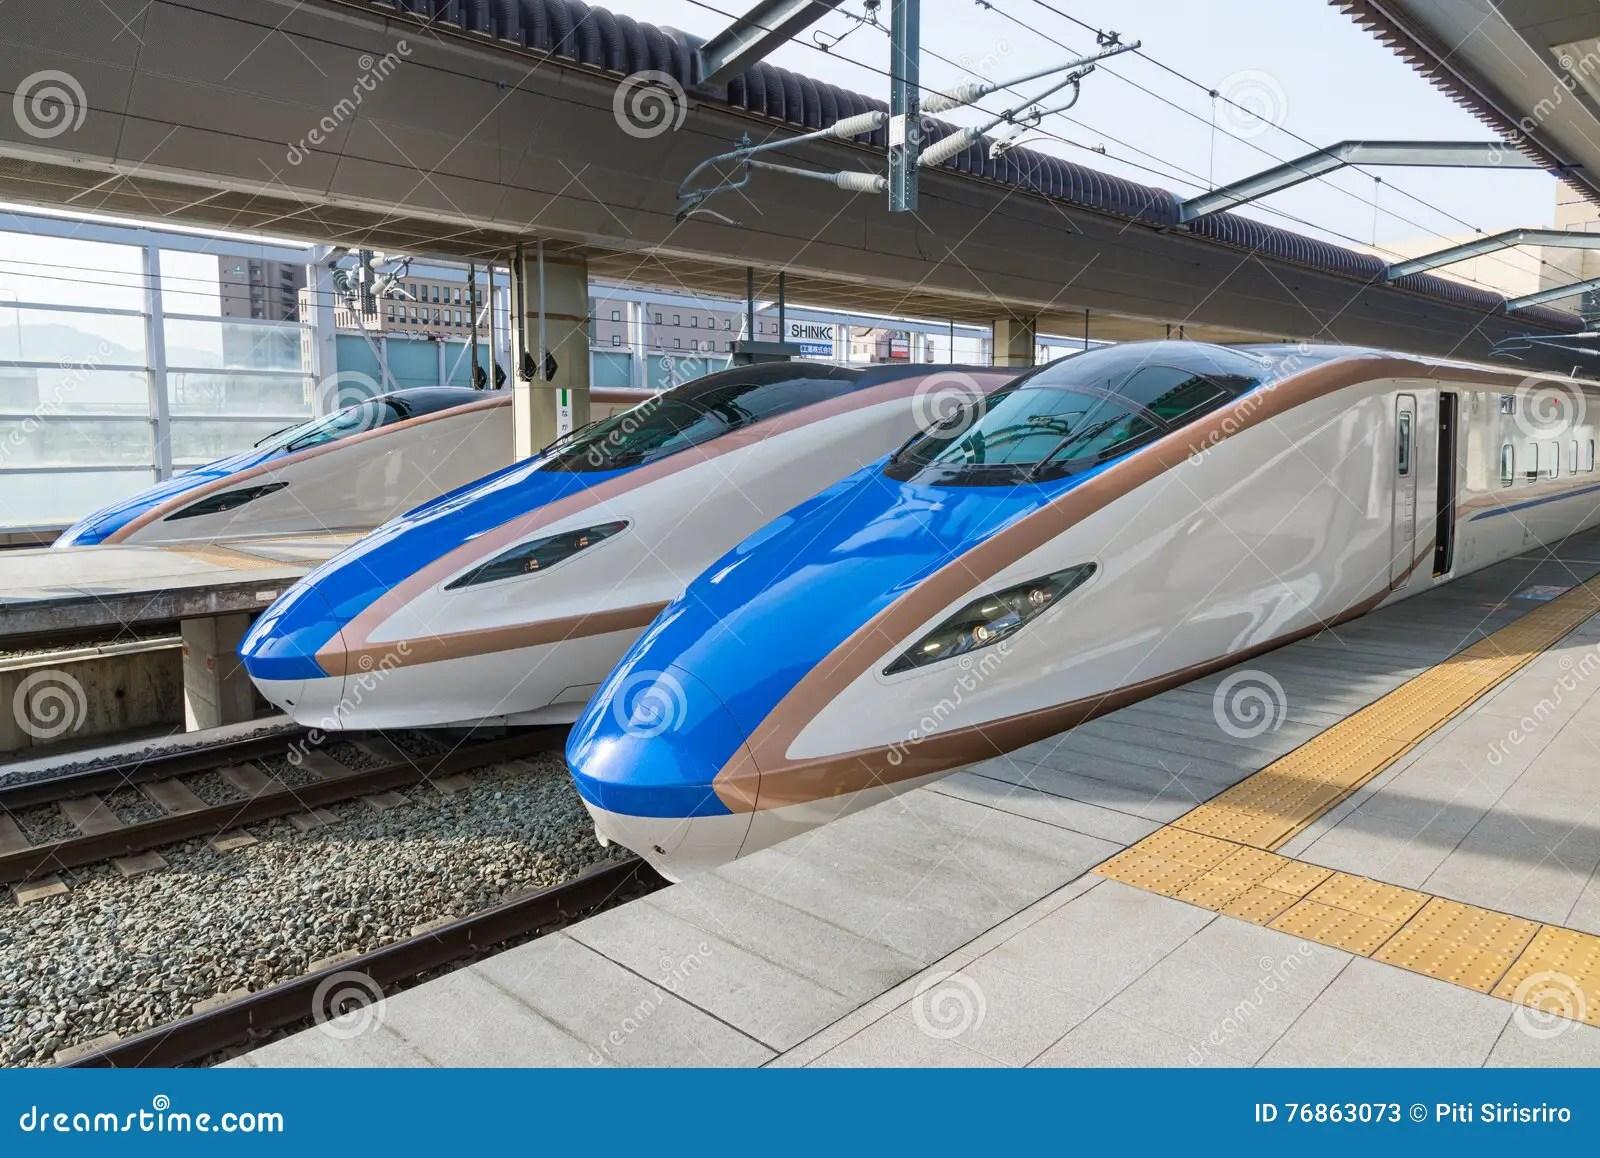 E7 W7 Series Bullet High Speed Or Shinkansen Trains